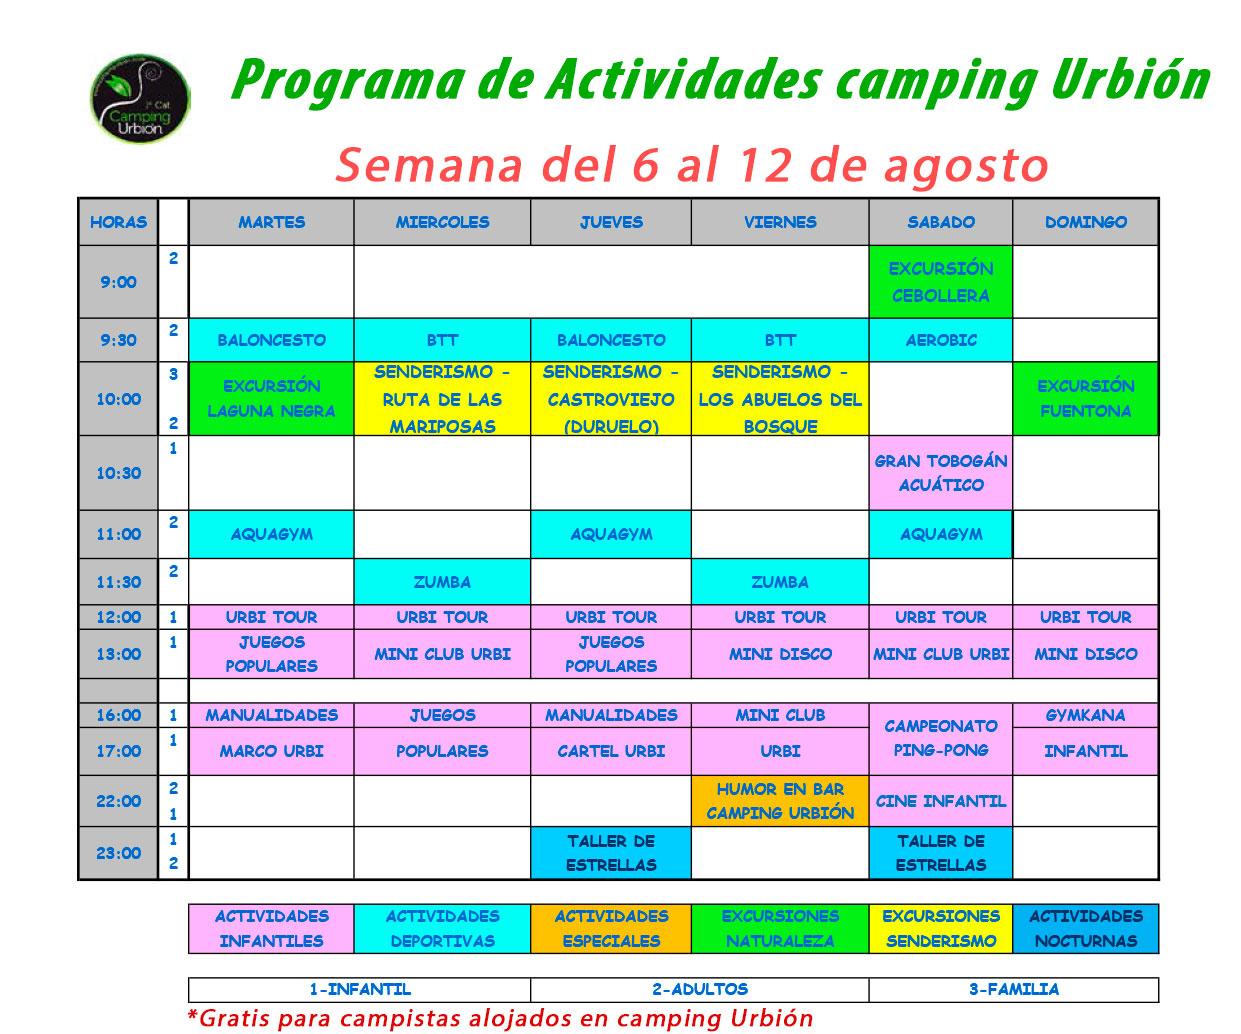 PROGRAMA-ACTIVIDADES-SEMANA-2-JULIO-CAMPING-URBION